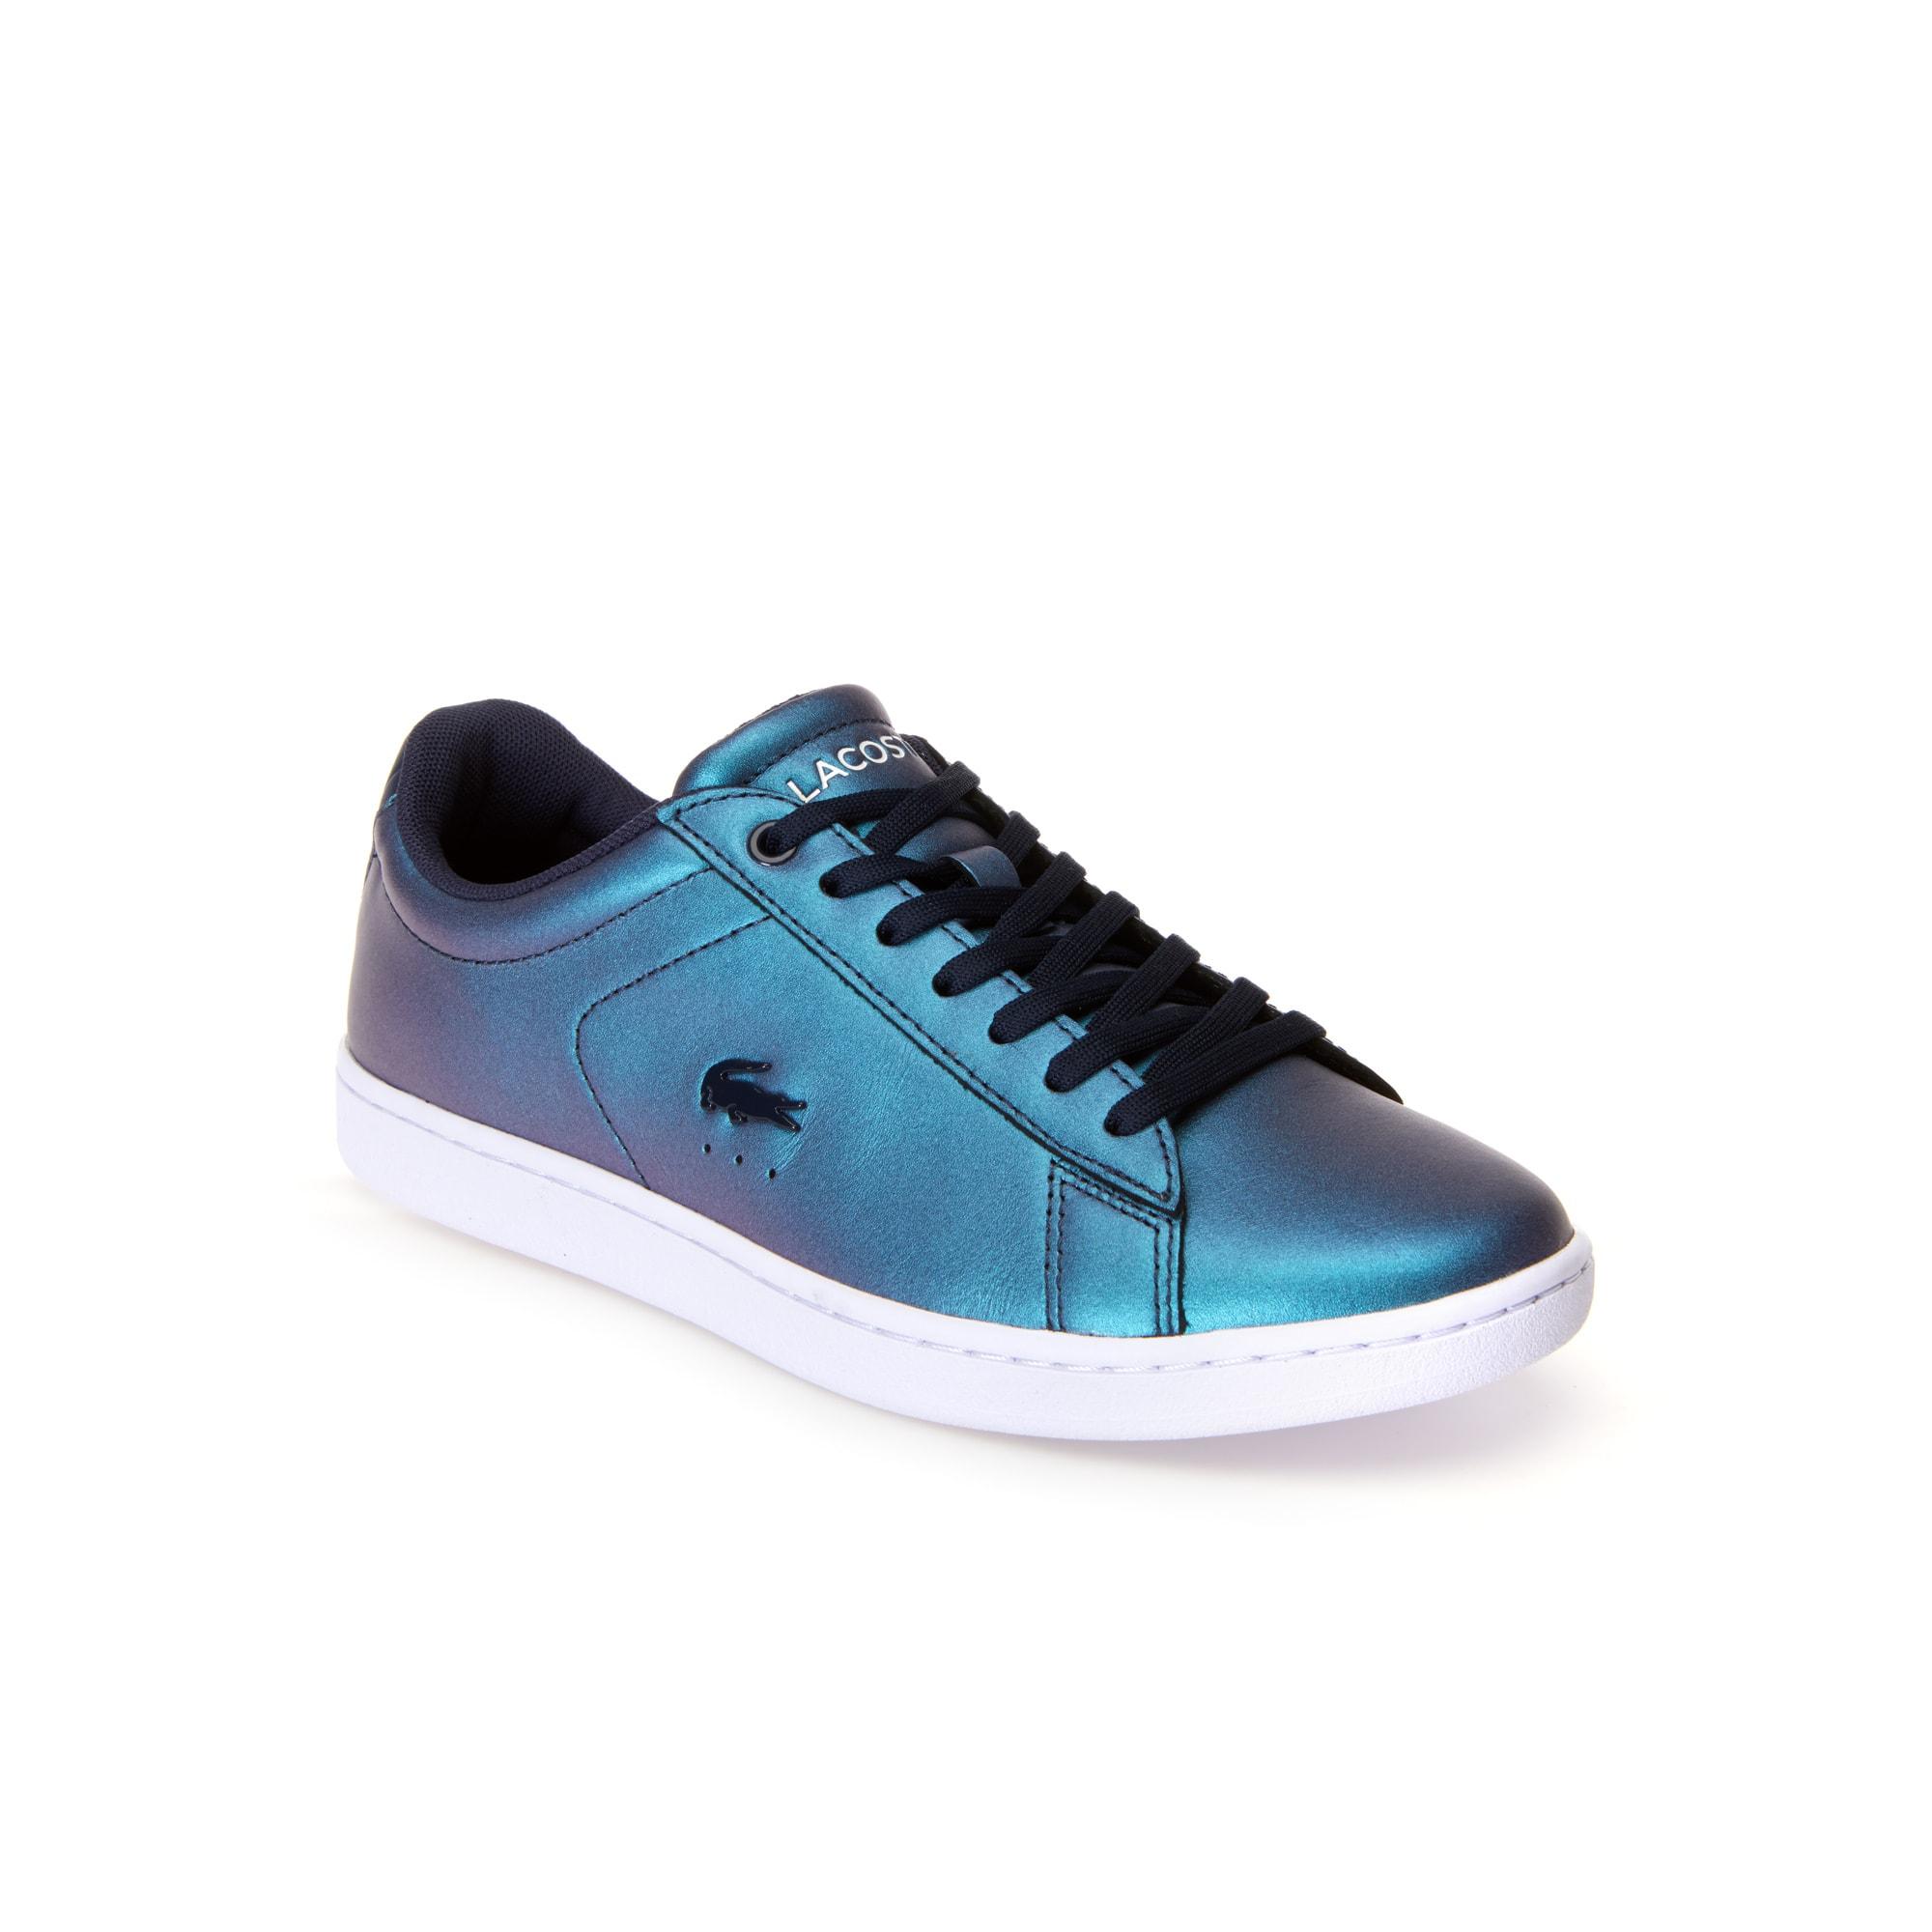 cb397e8875a Lacoste shoes for women  Boots